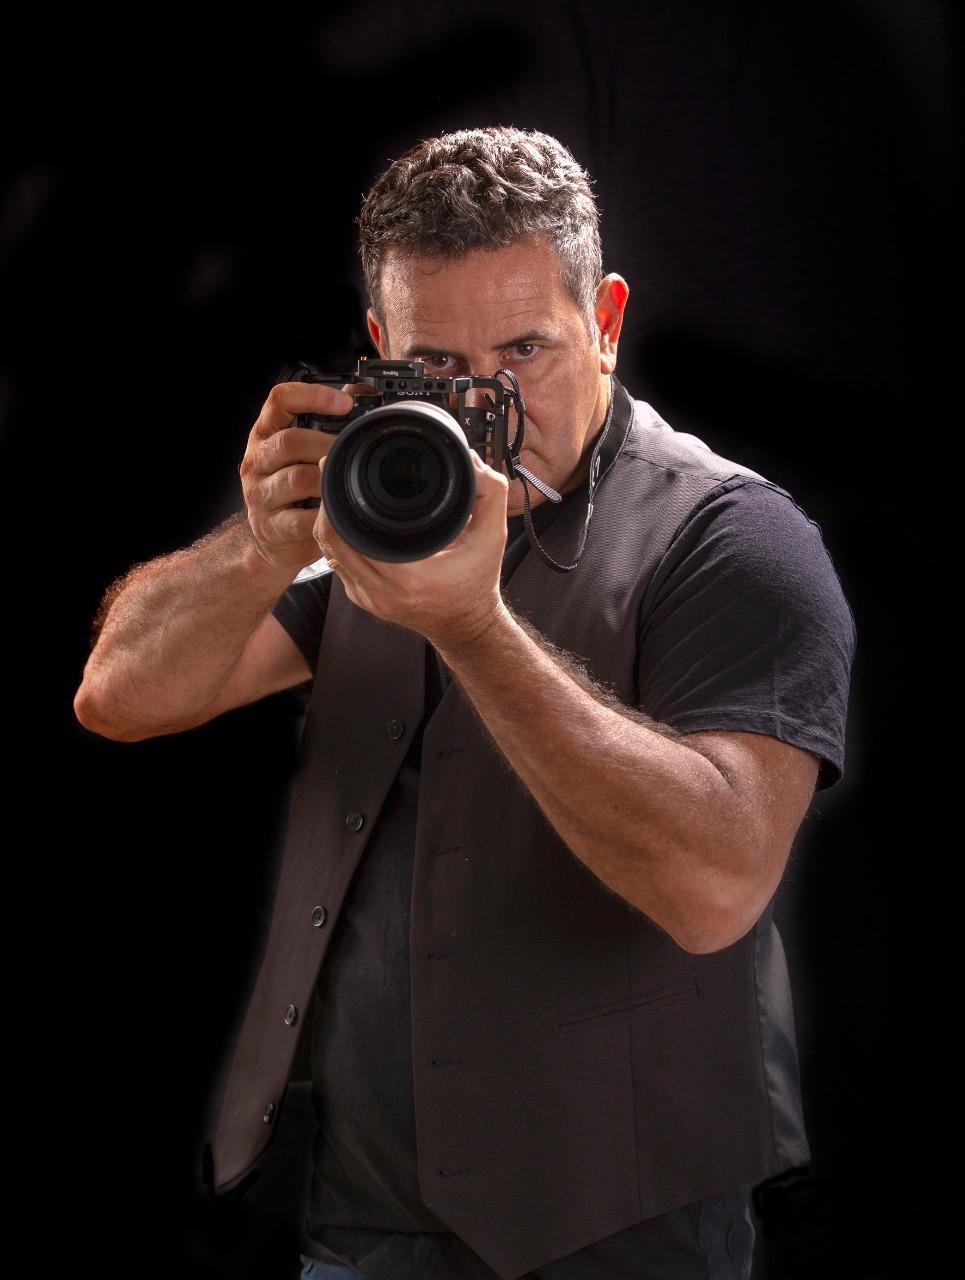 Sobre Fotógrafo Raniere Pedroza